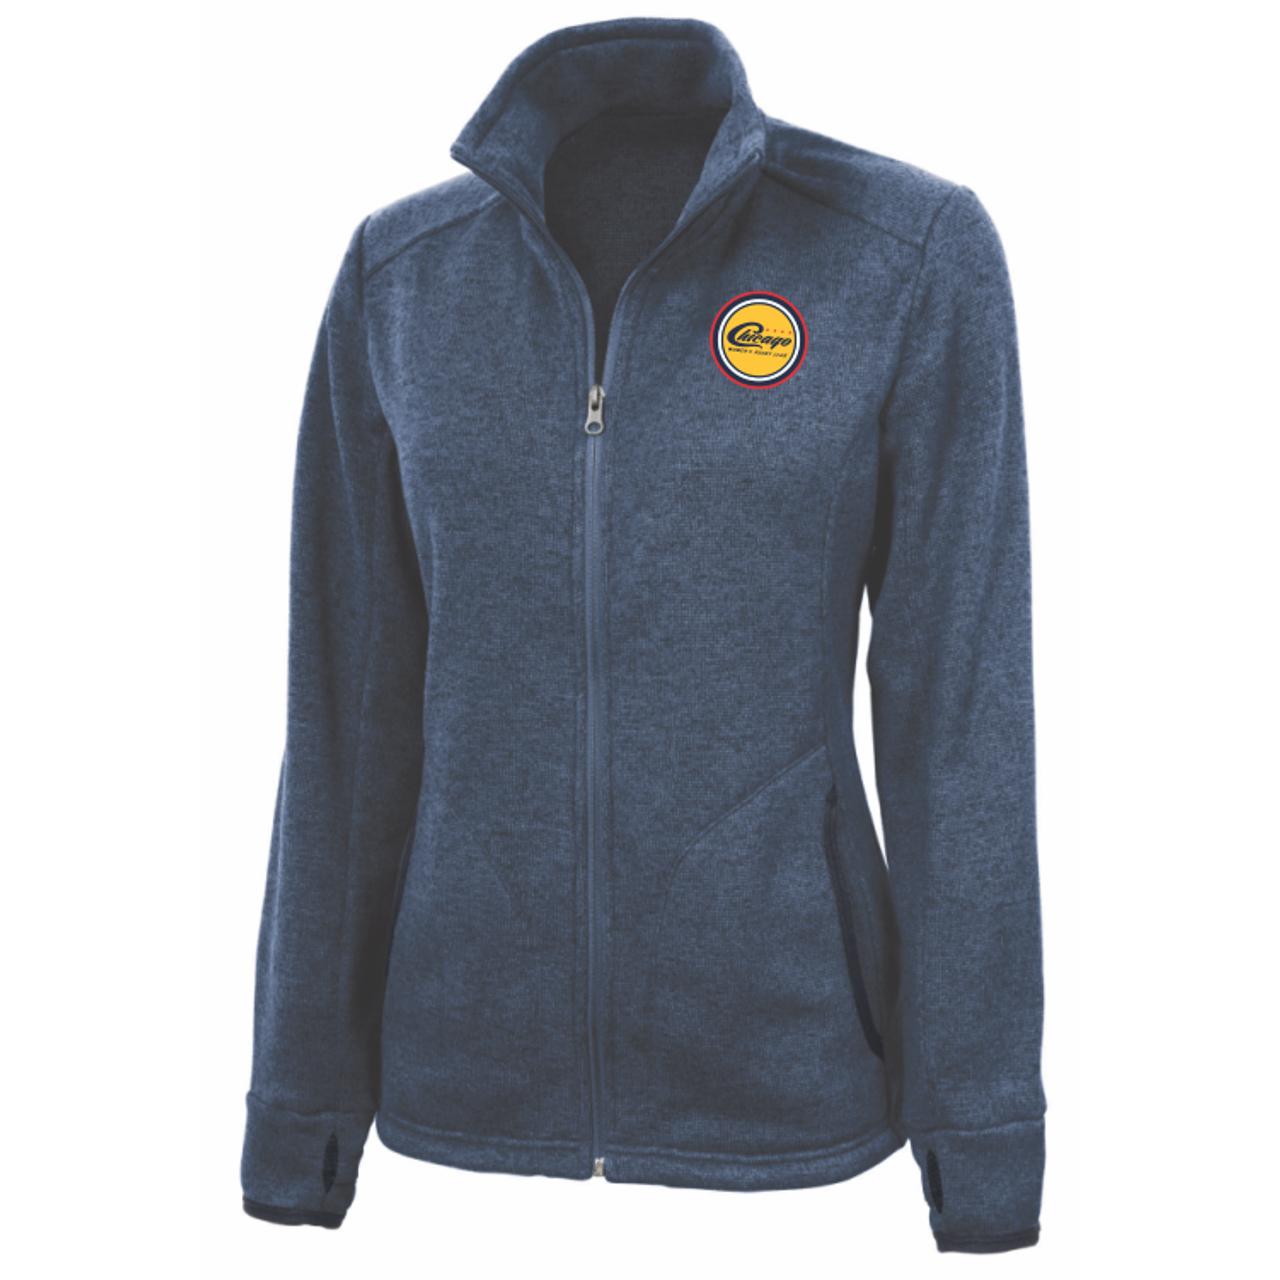 Chicago WRFC Heathered-Knit Fleece Jacket